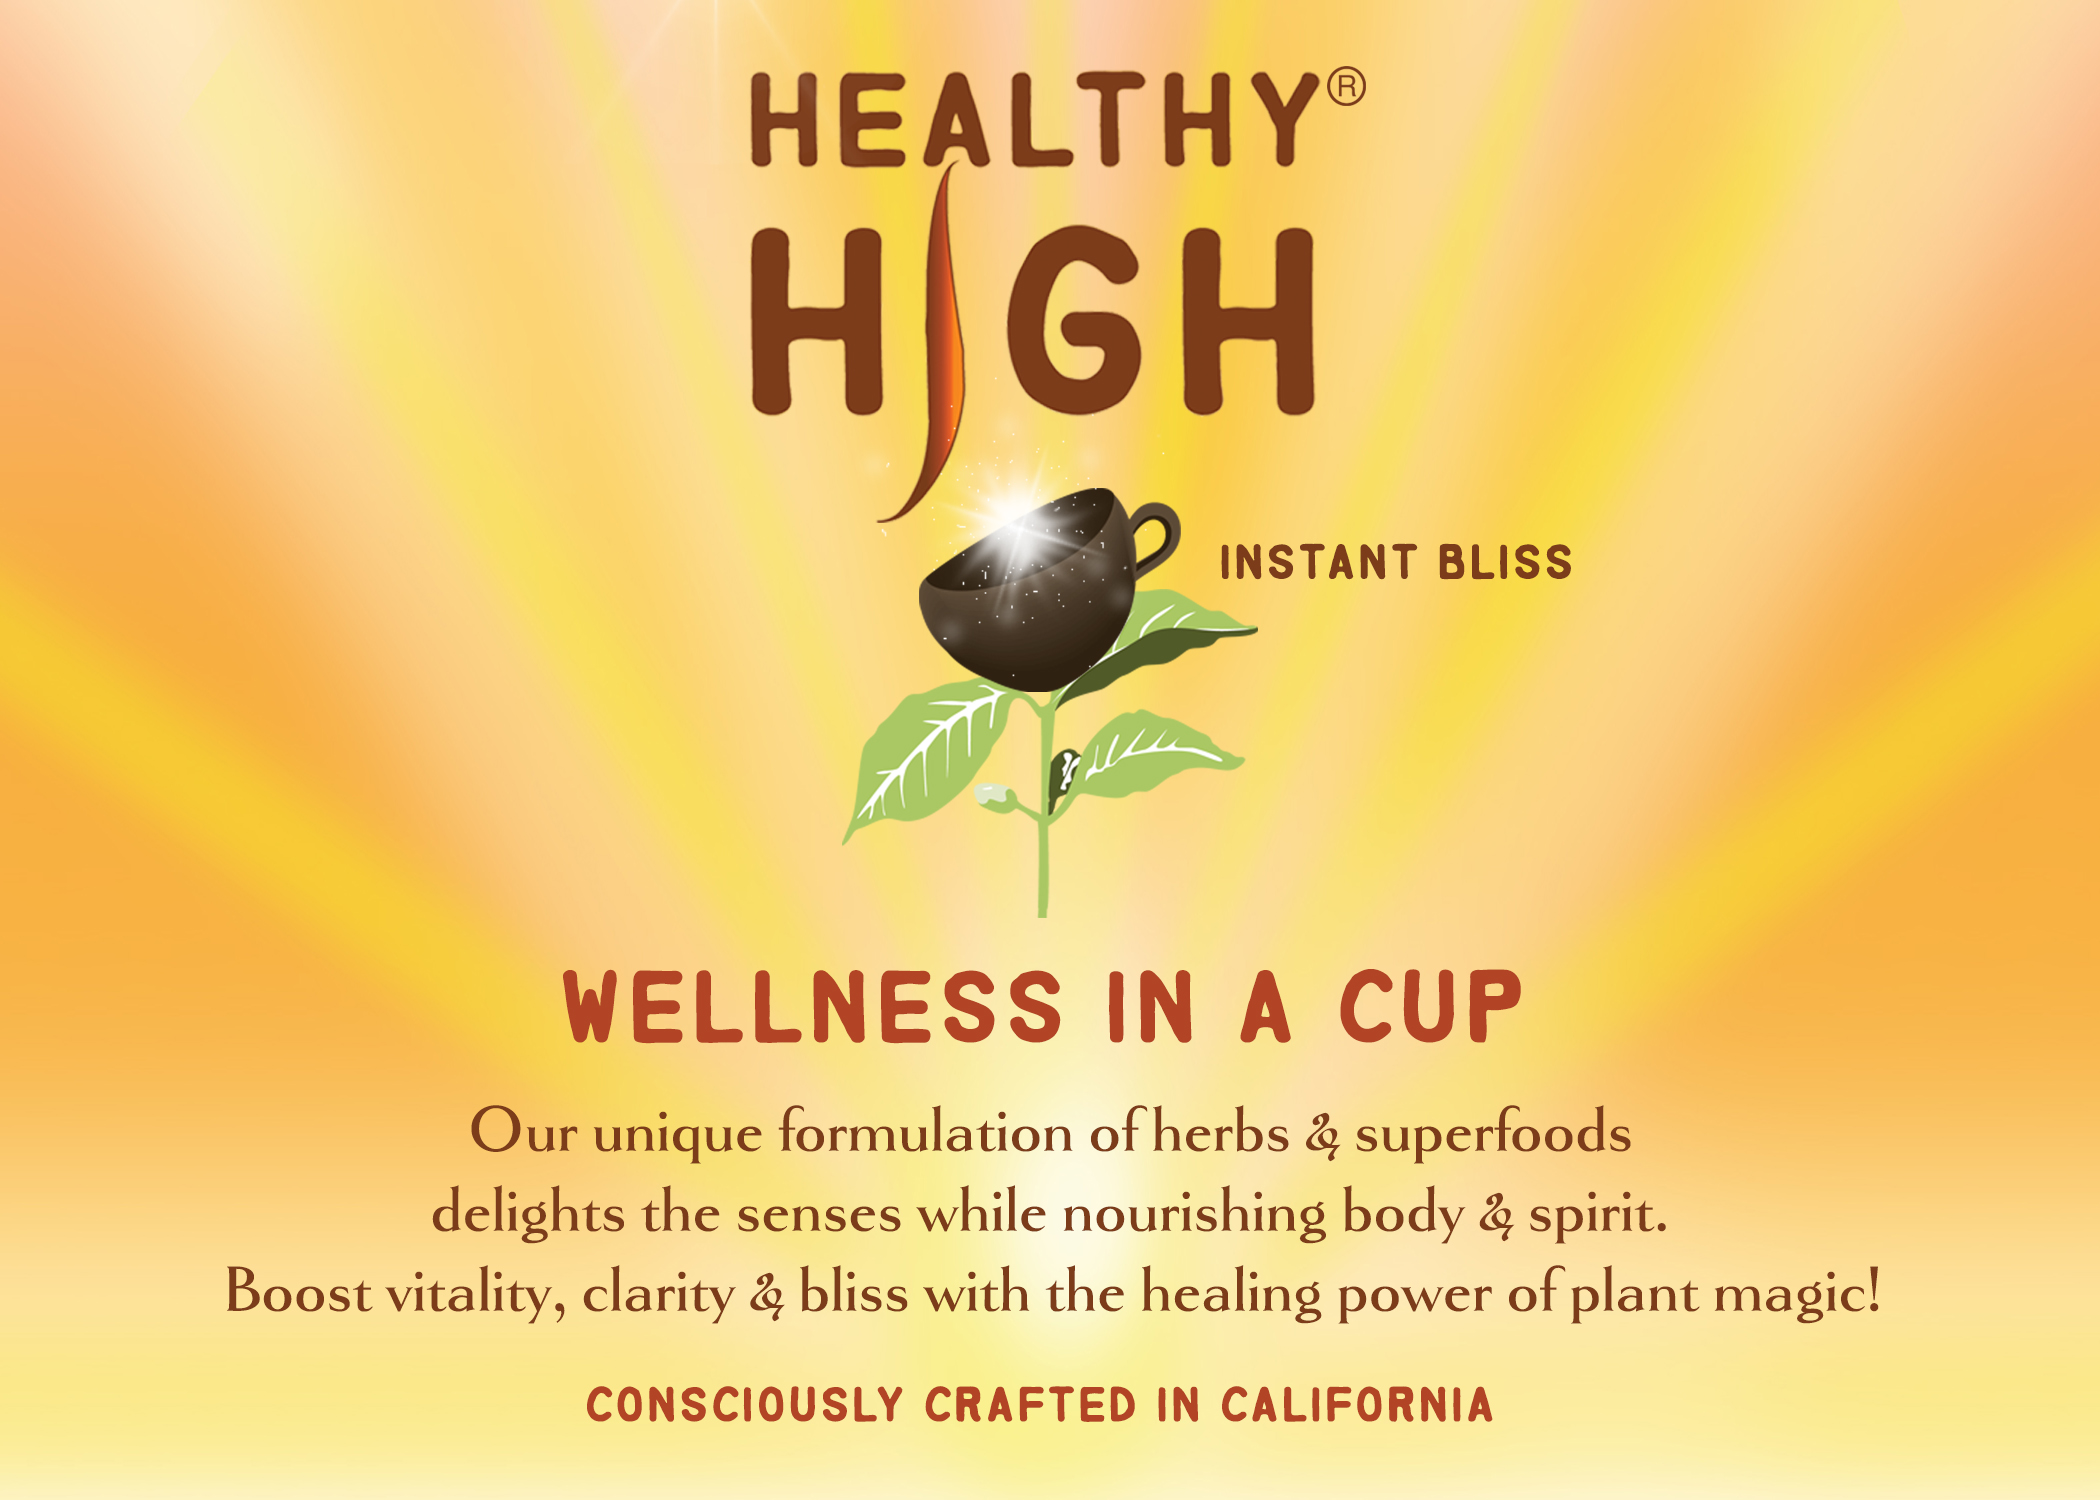 HealthyHighPostcard.jpg